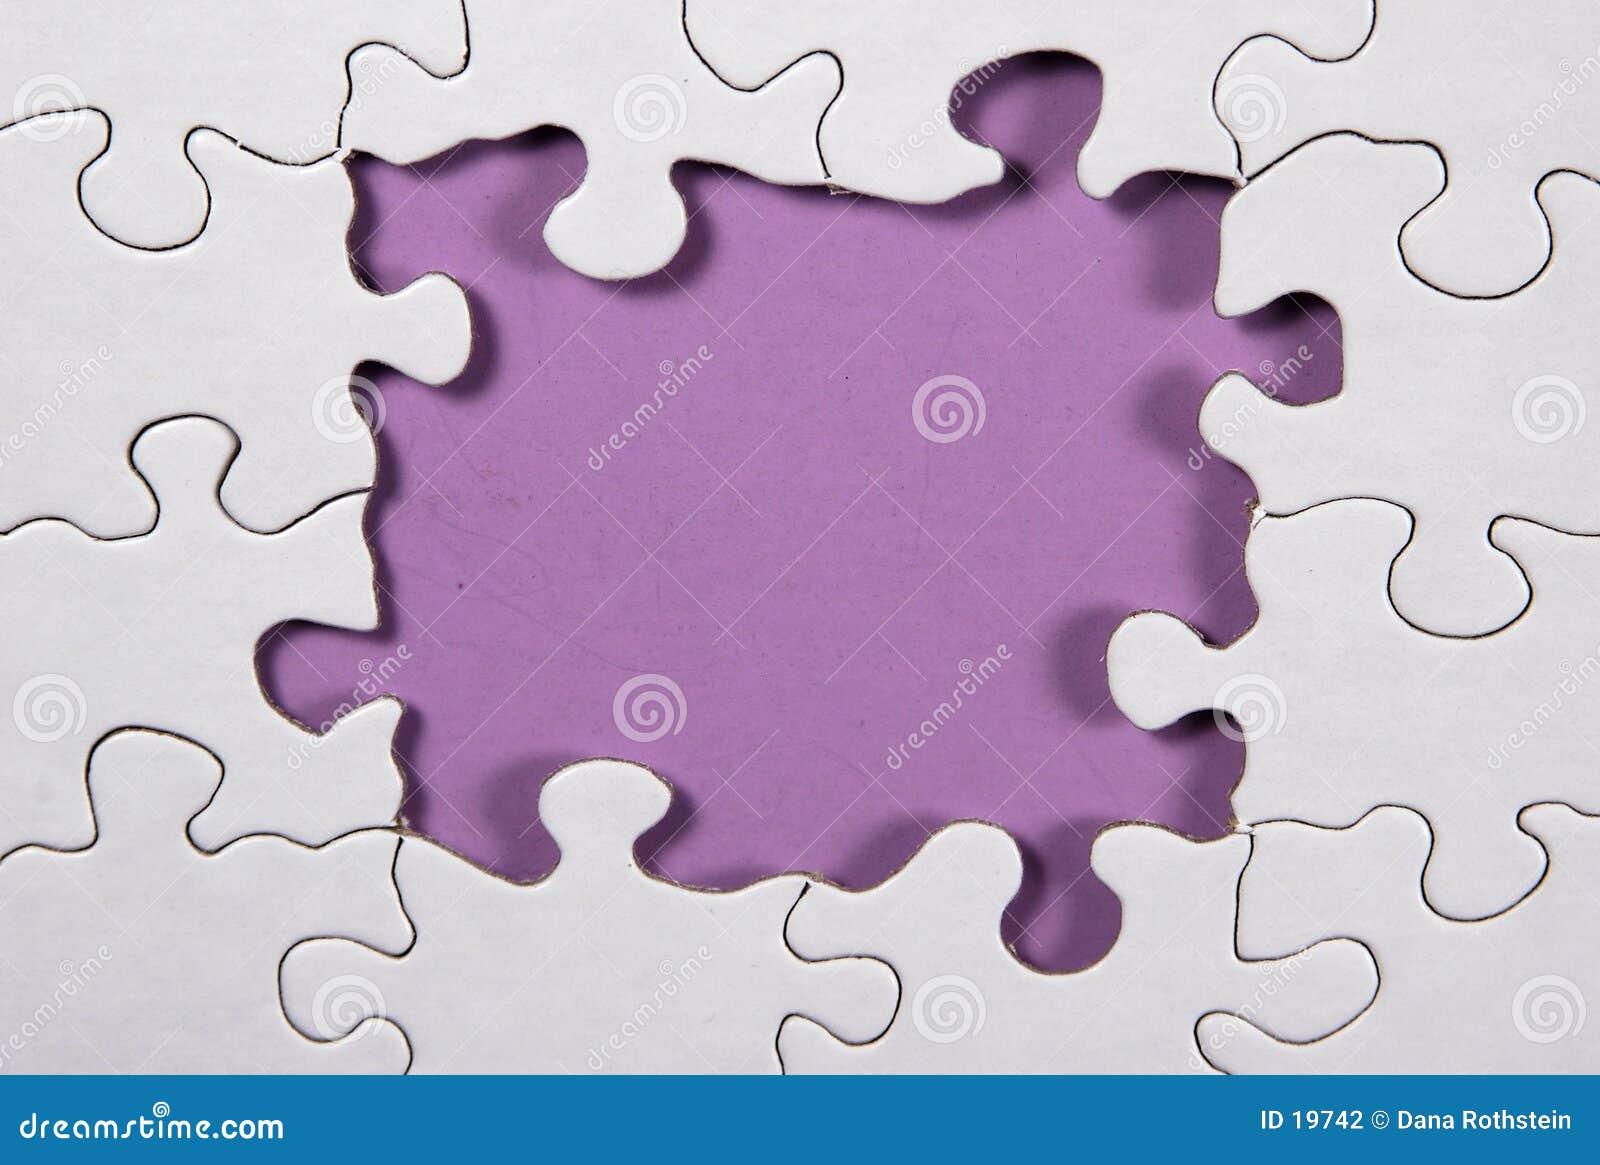 Fioletowo - puzzle tło